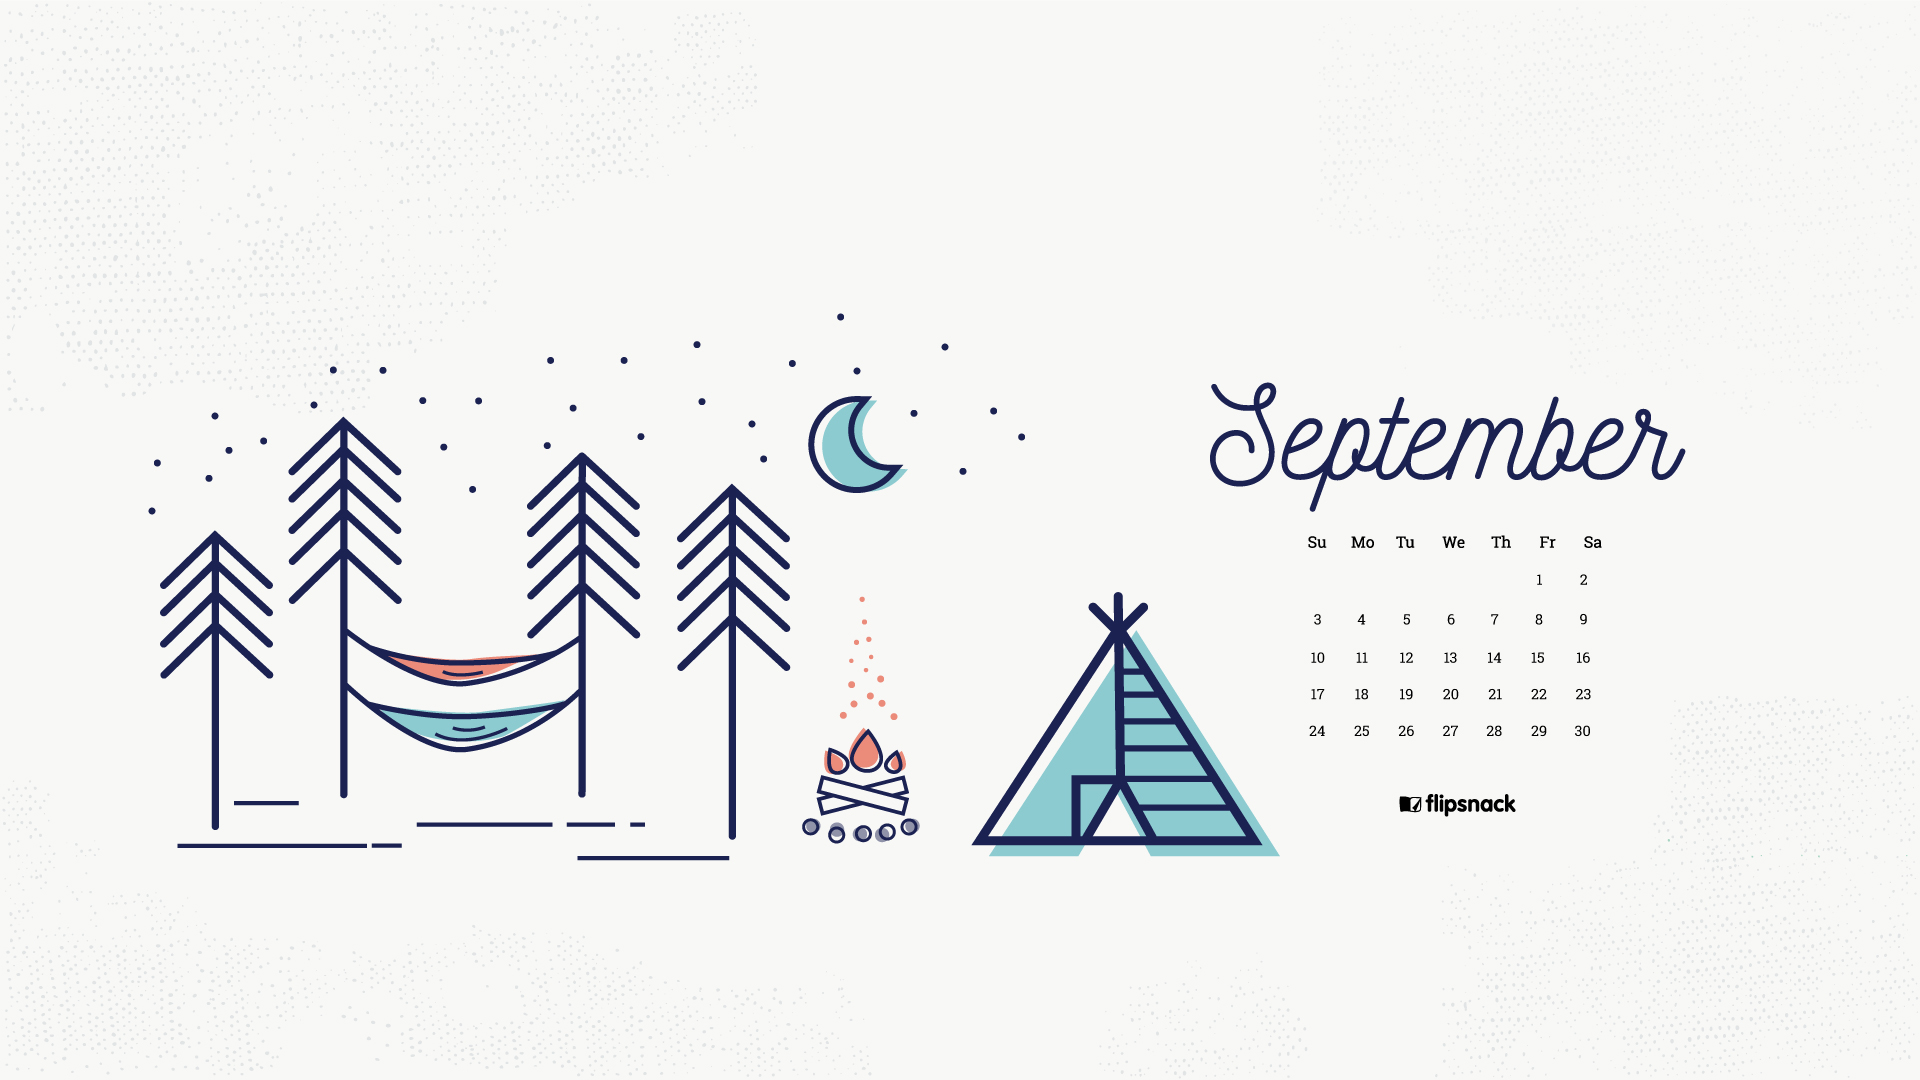 March 2018 Cute Full Screen Desktop Wallpapers Your September 2017 Calendar Wallpaper Is Here Get It